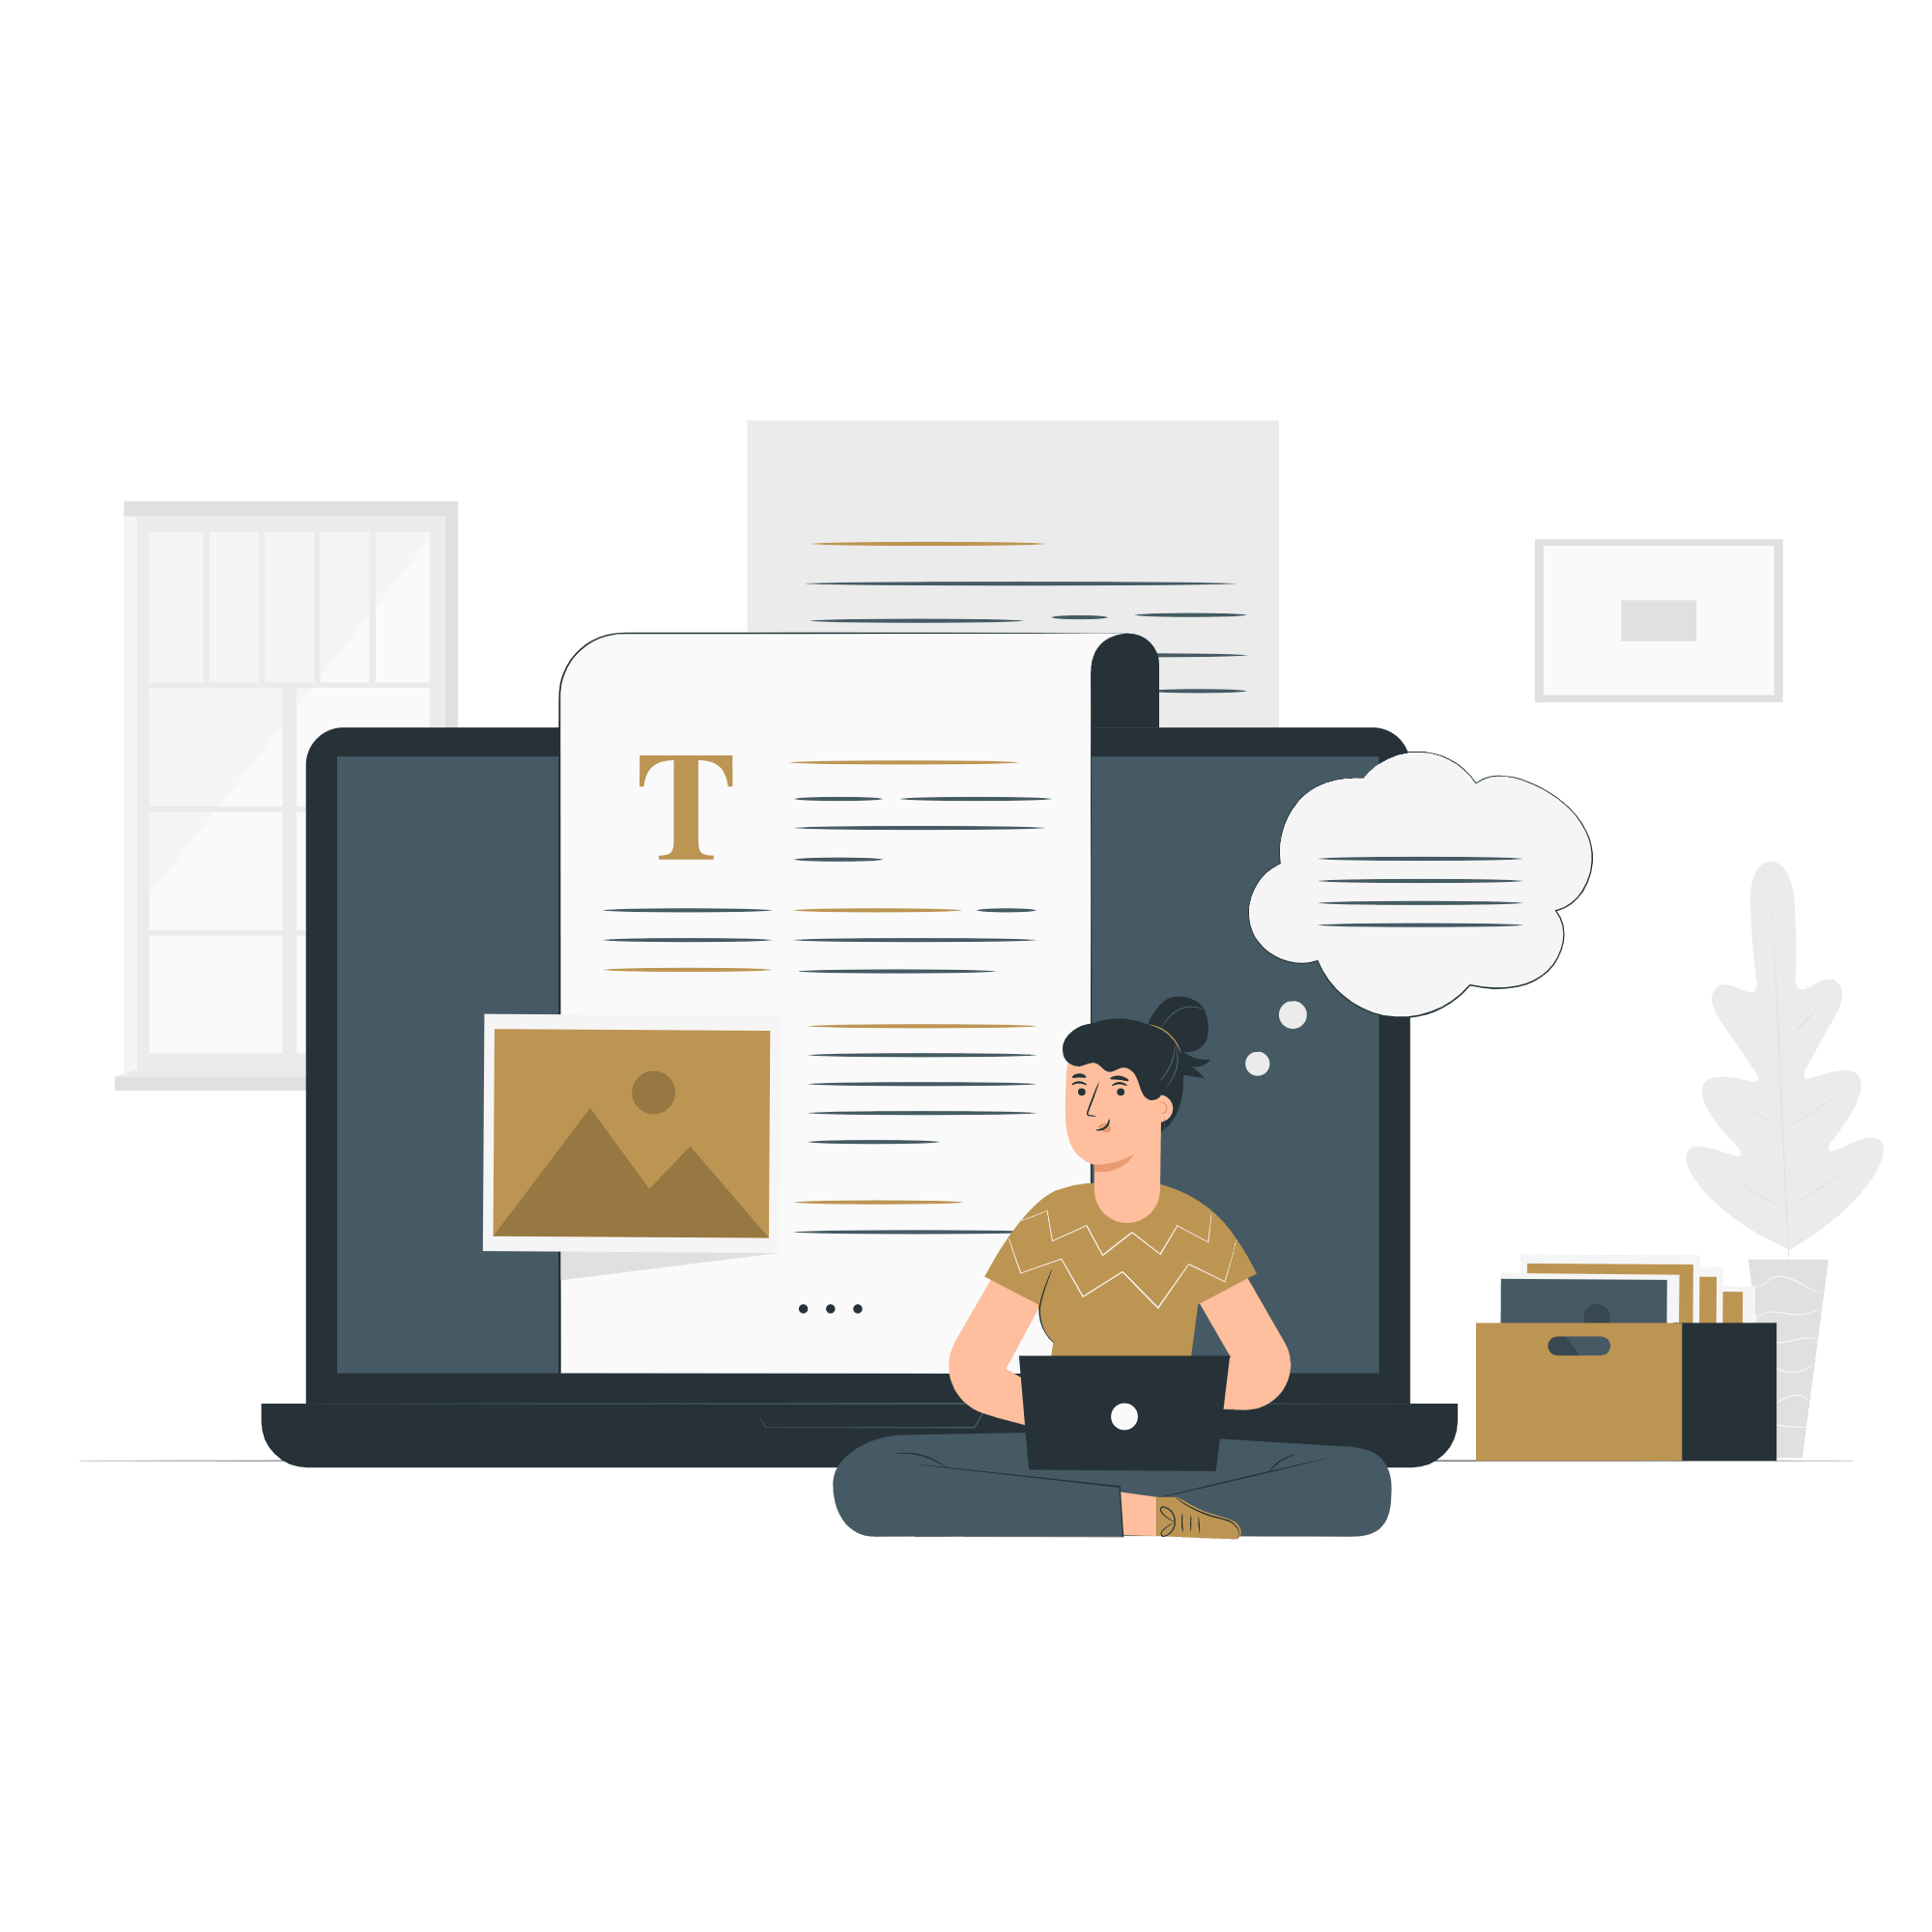 Malaysia Online Business Blog Writing